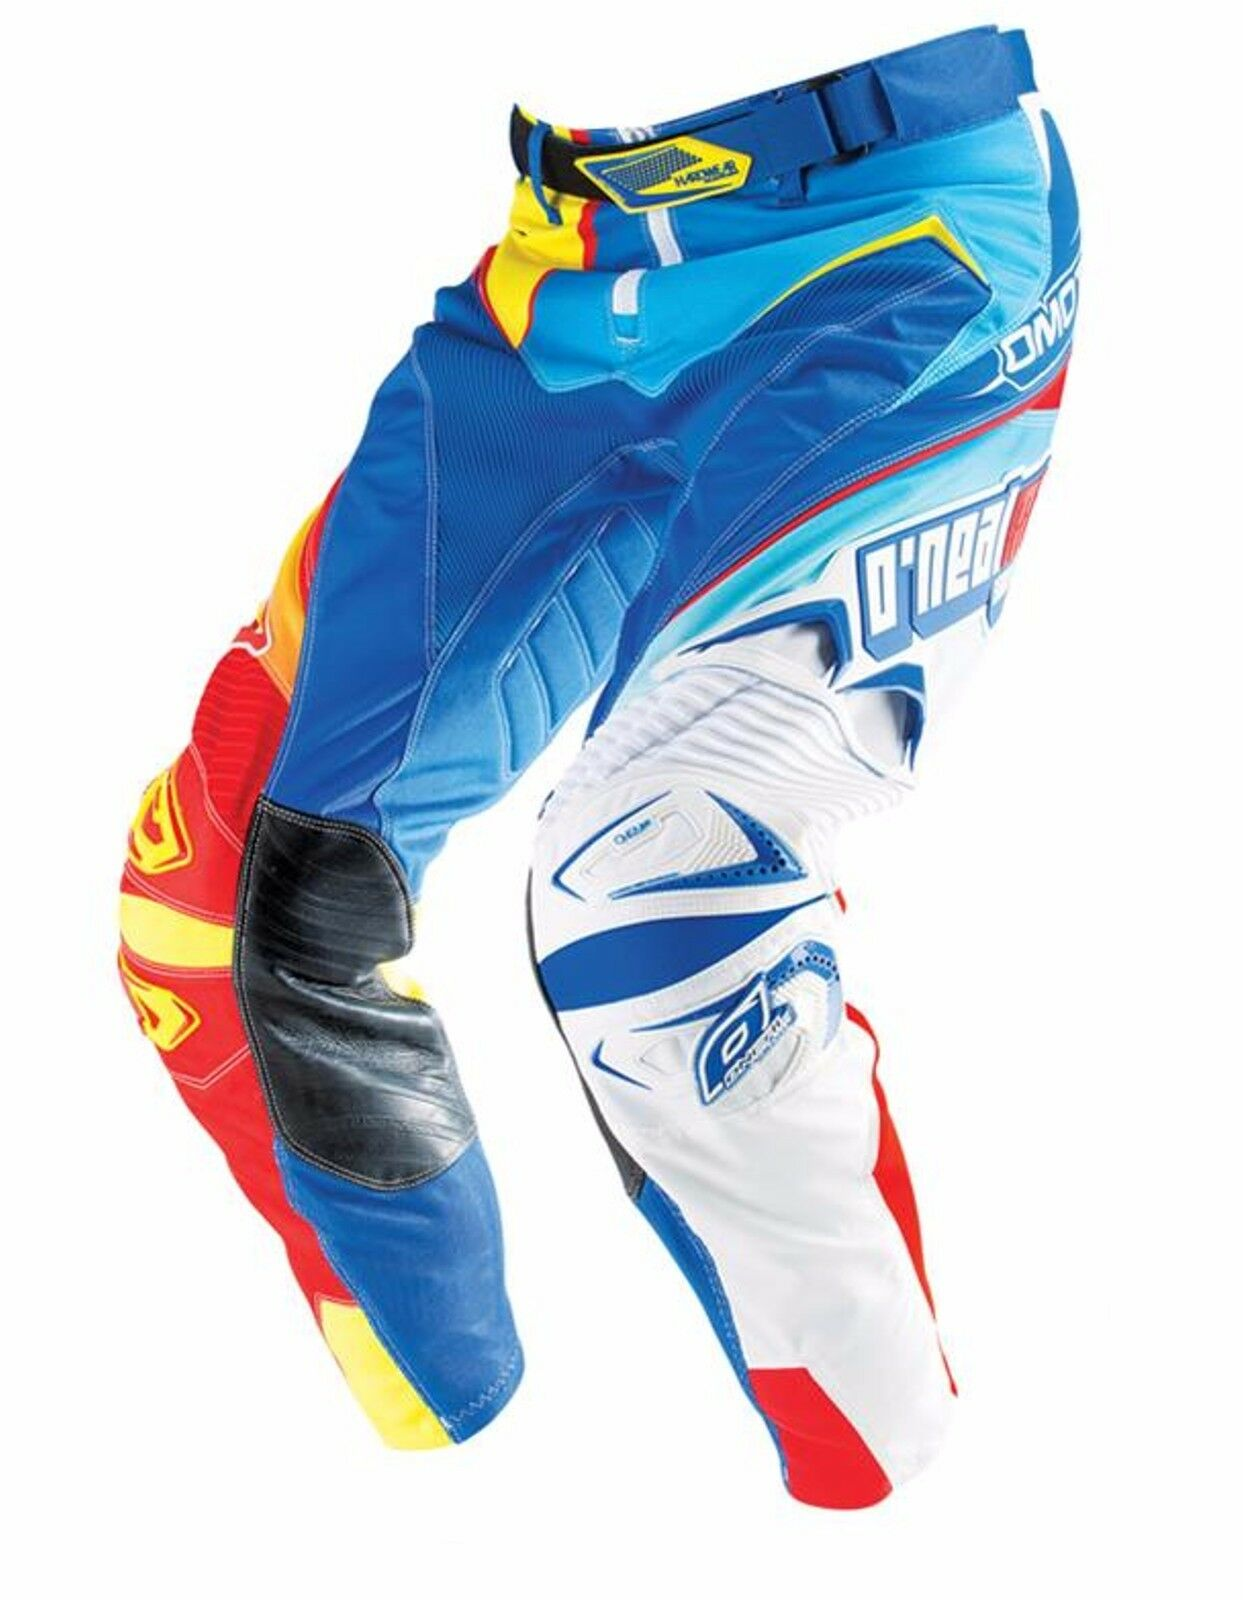 O'Neal Hardwear Racewear Men's Pants Lightweight Predective  bluee  Red Yellow S  offering store